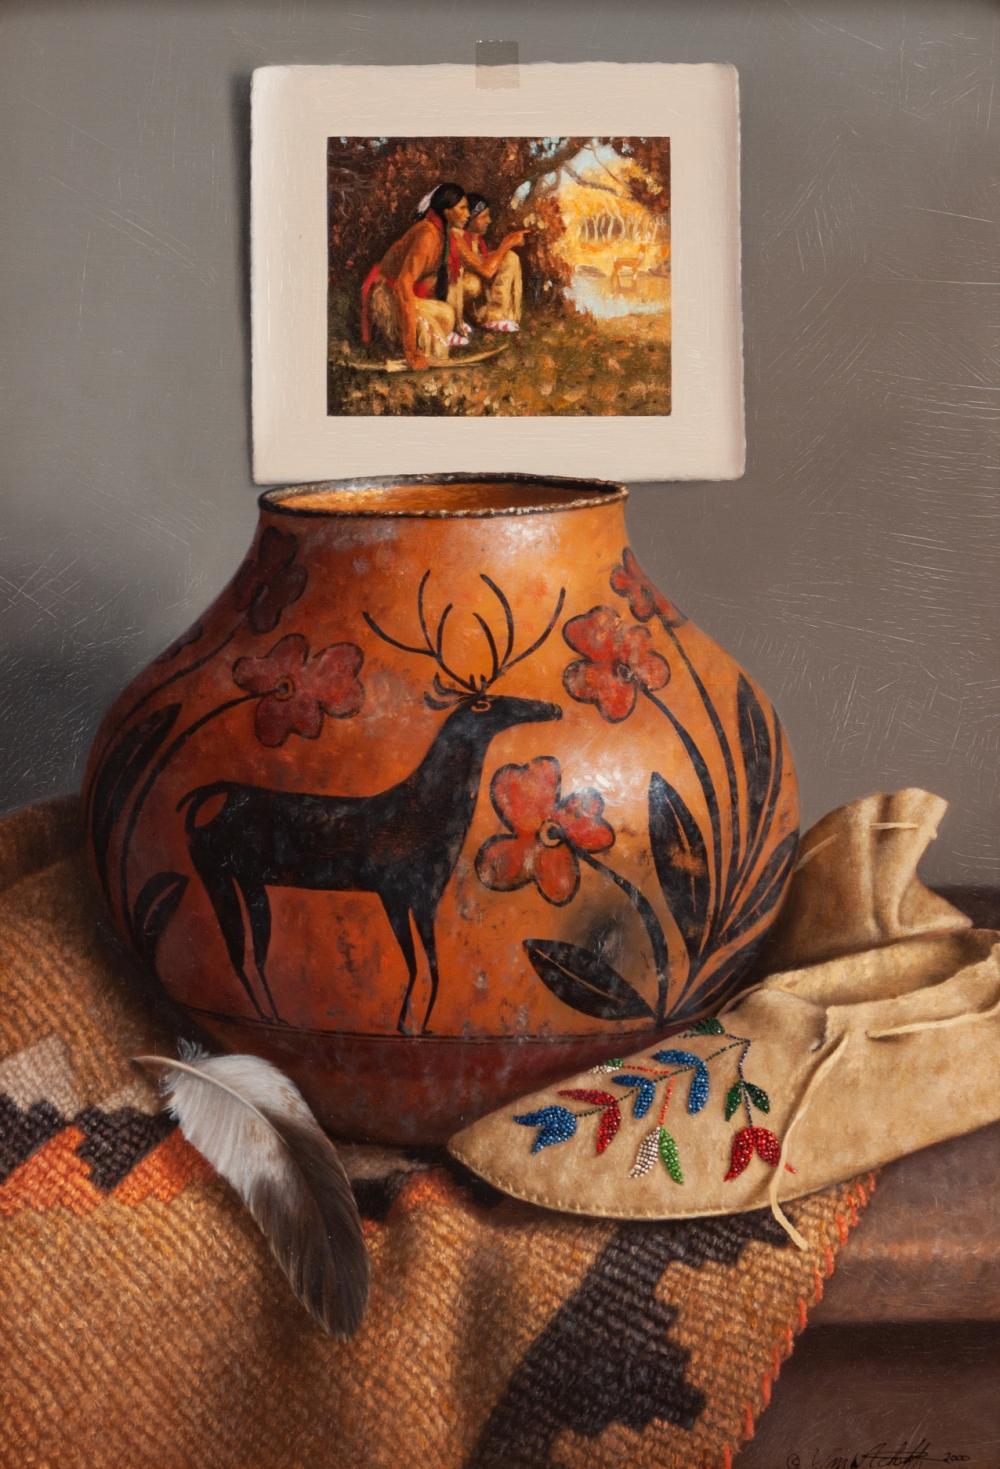 William Acheff (American, b. 1947) Deer Hunter, 2000